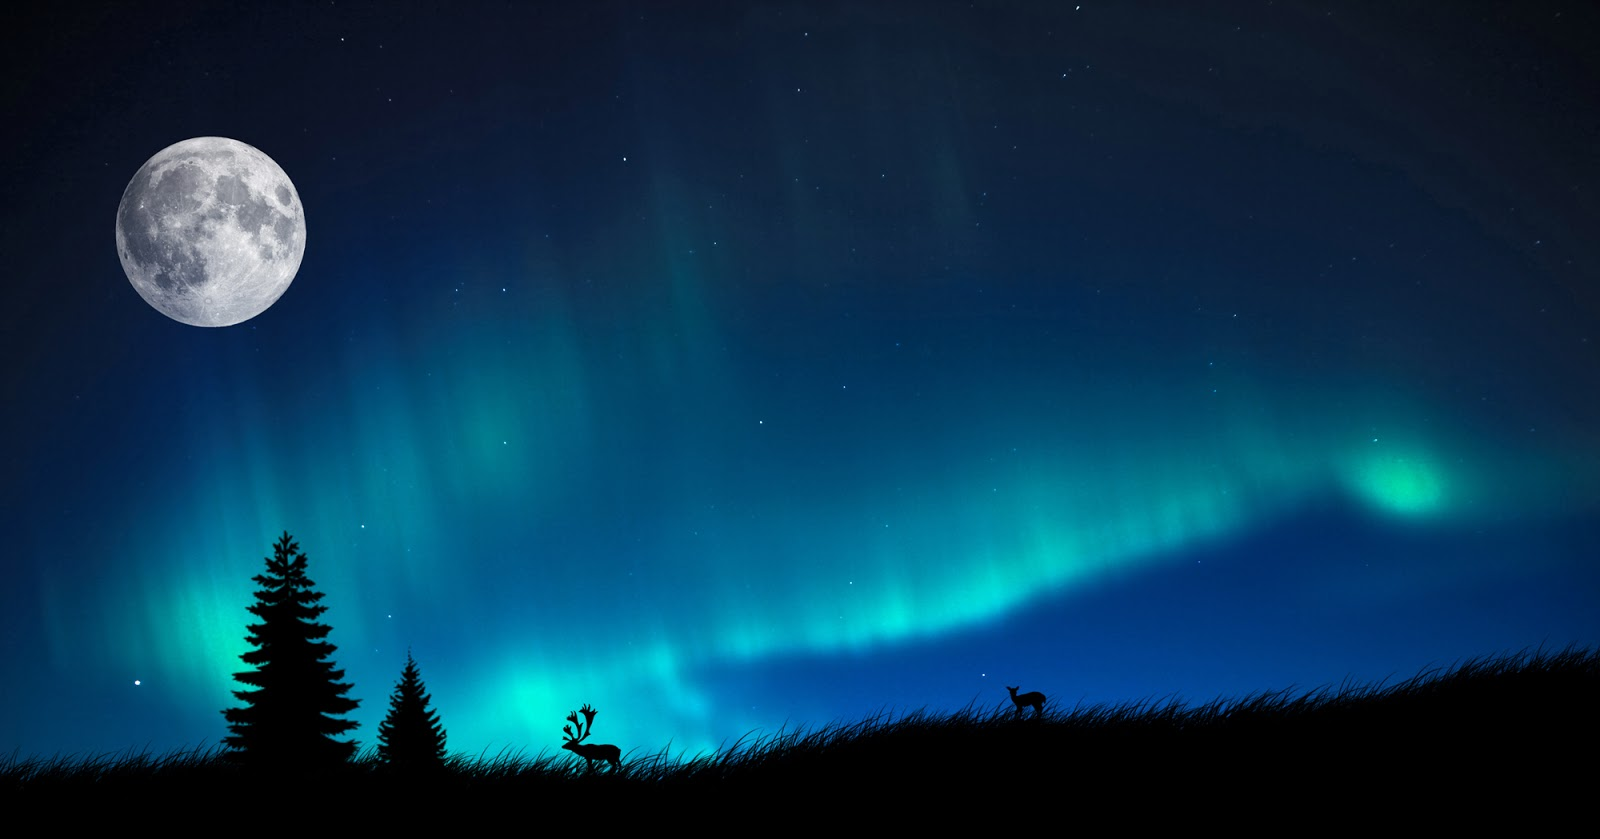 1000 Wallpapers Cute Moon And Aurora Borealis Wallpaper Beauty Walpaper